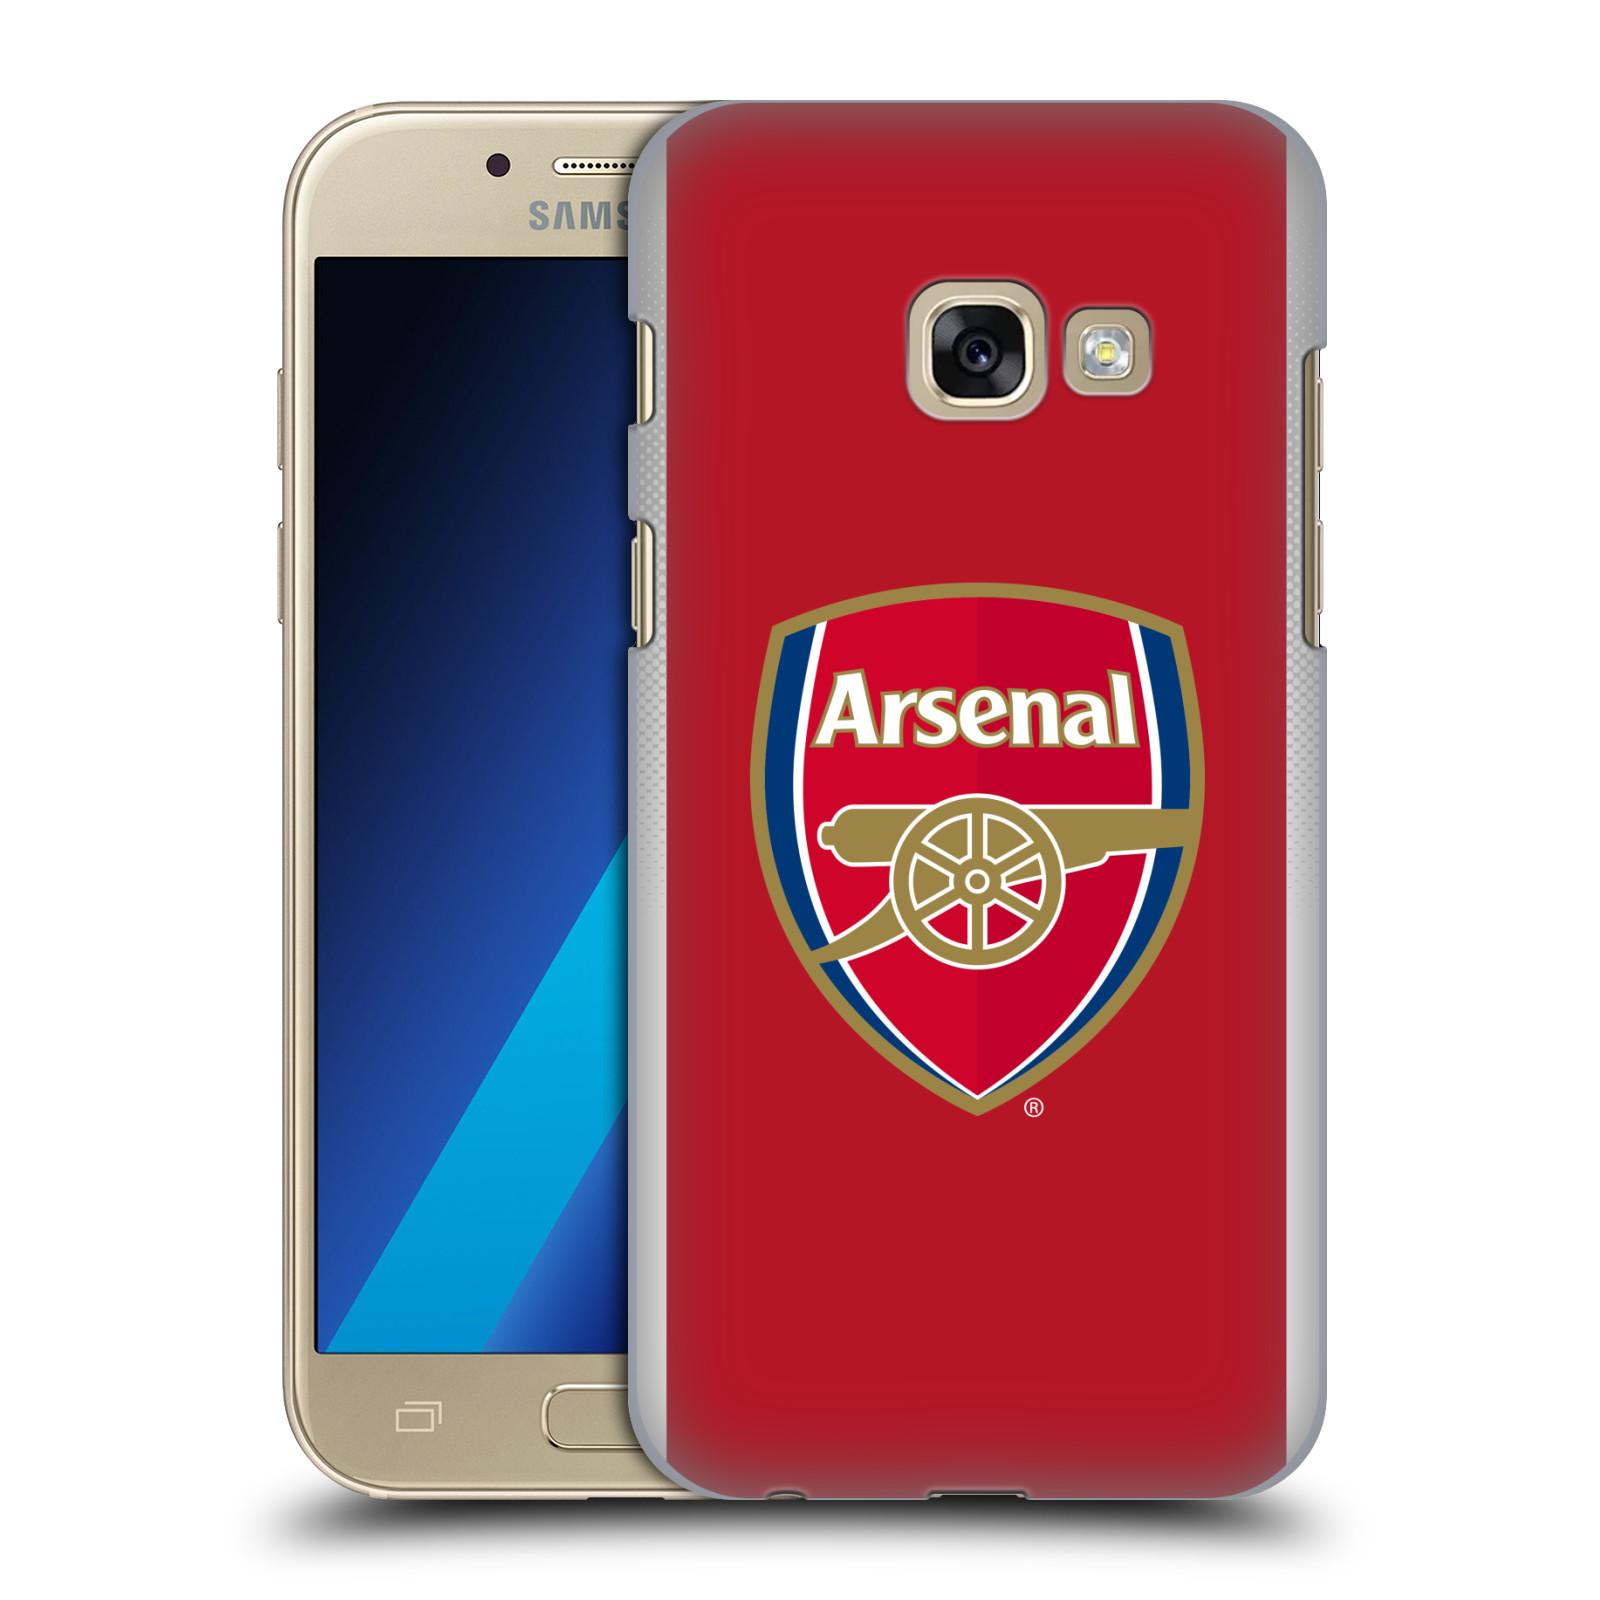 Plastové pouzdro na mobil Samsung Galaxy A3 (2017) - Head Case - Arsenal FC - Logo klubu